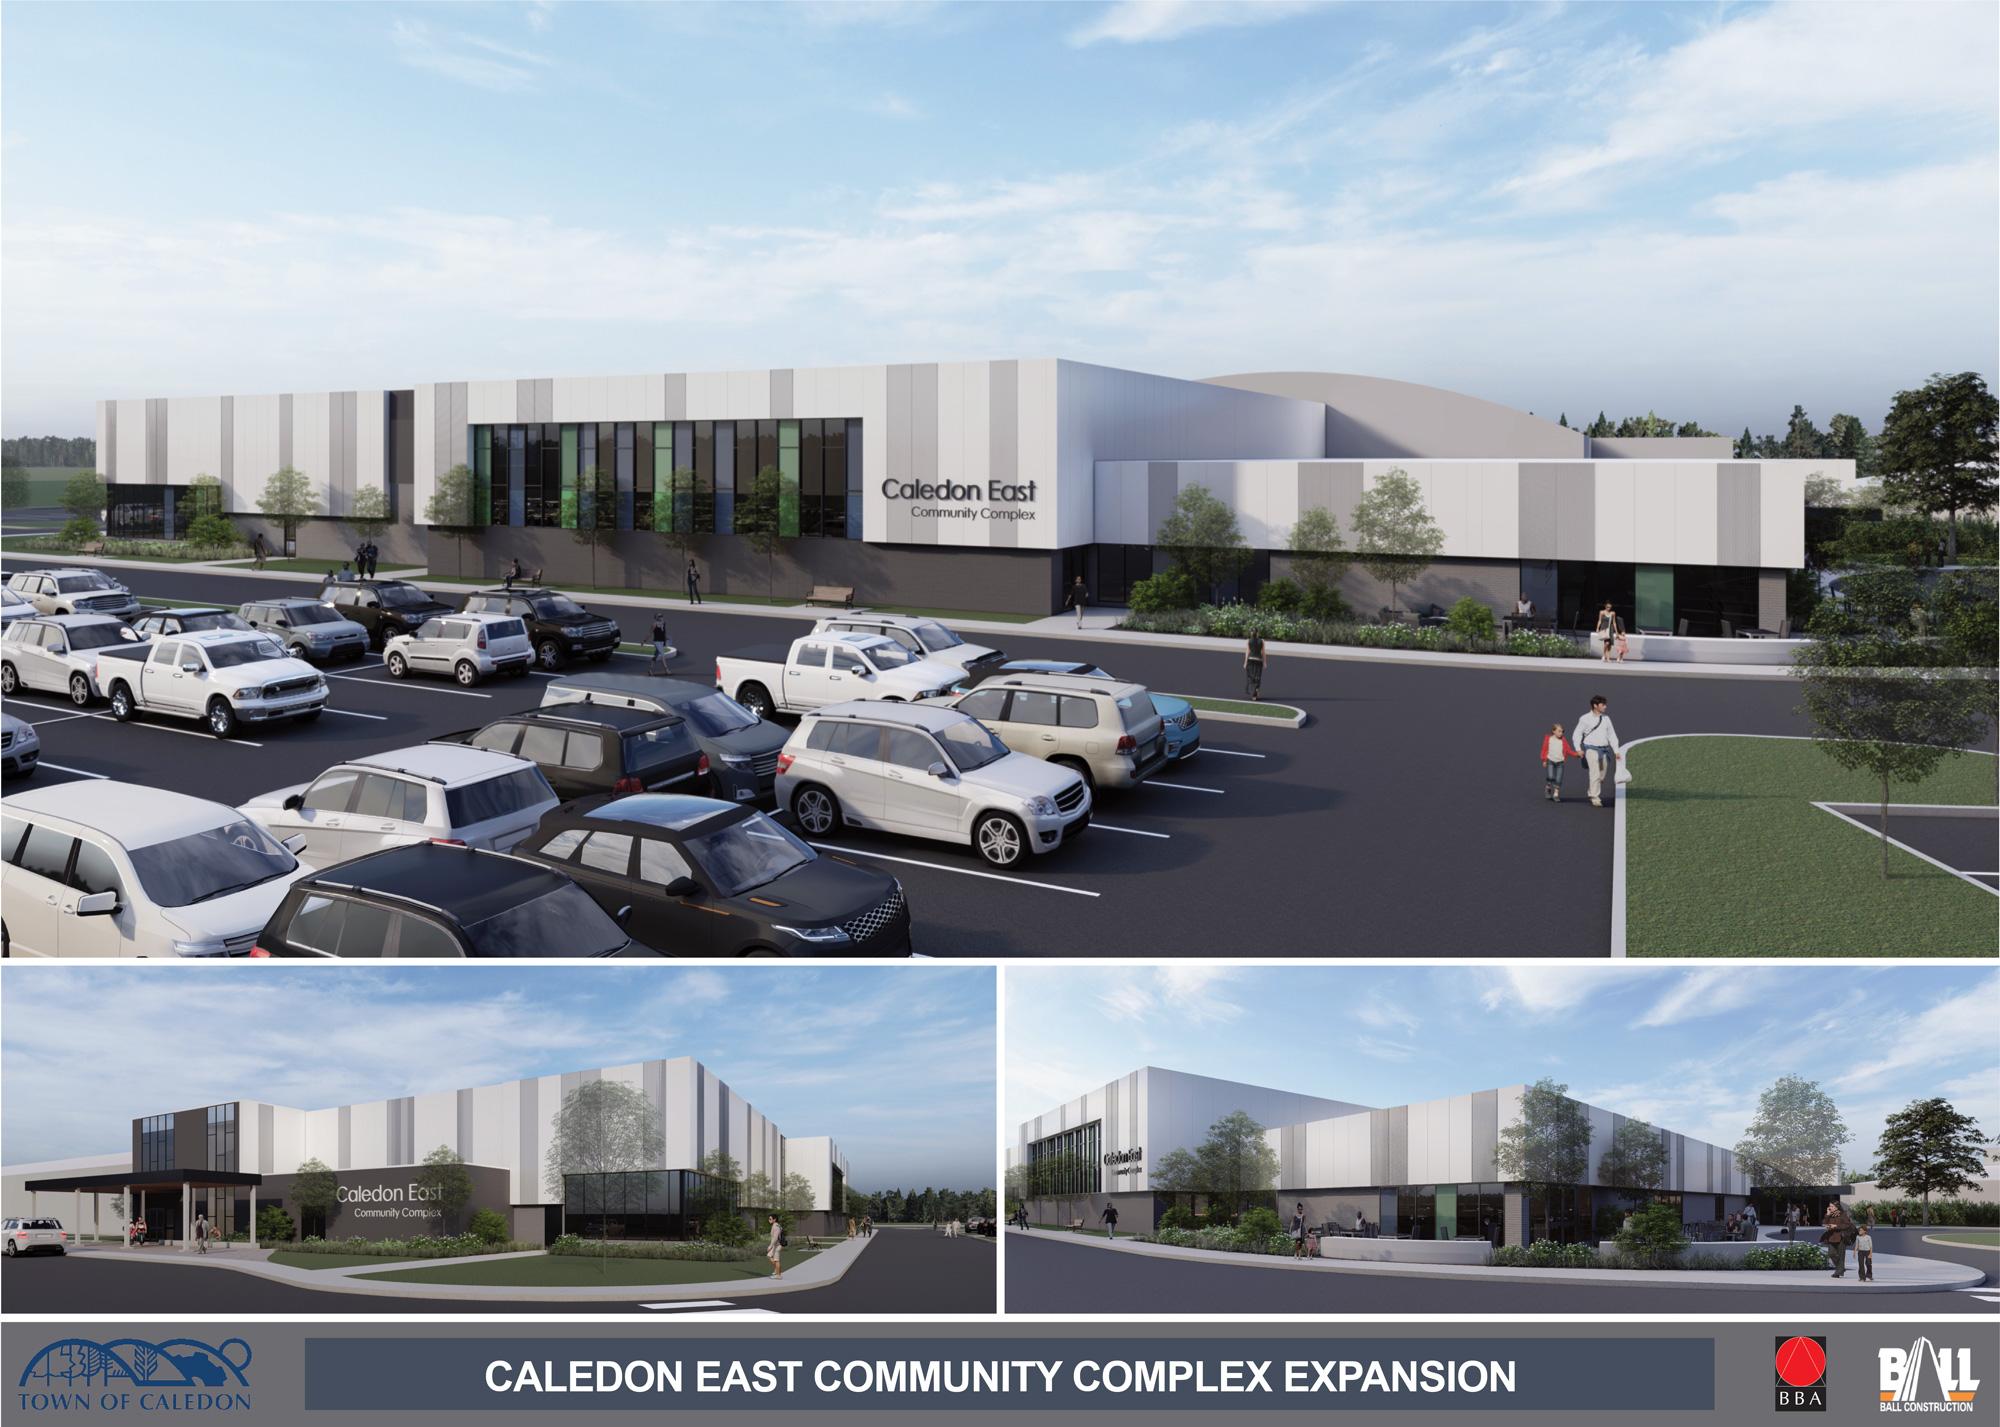 Caledon East Community Complex expansion